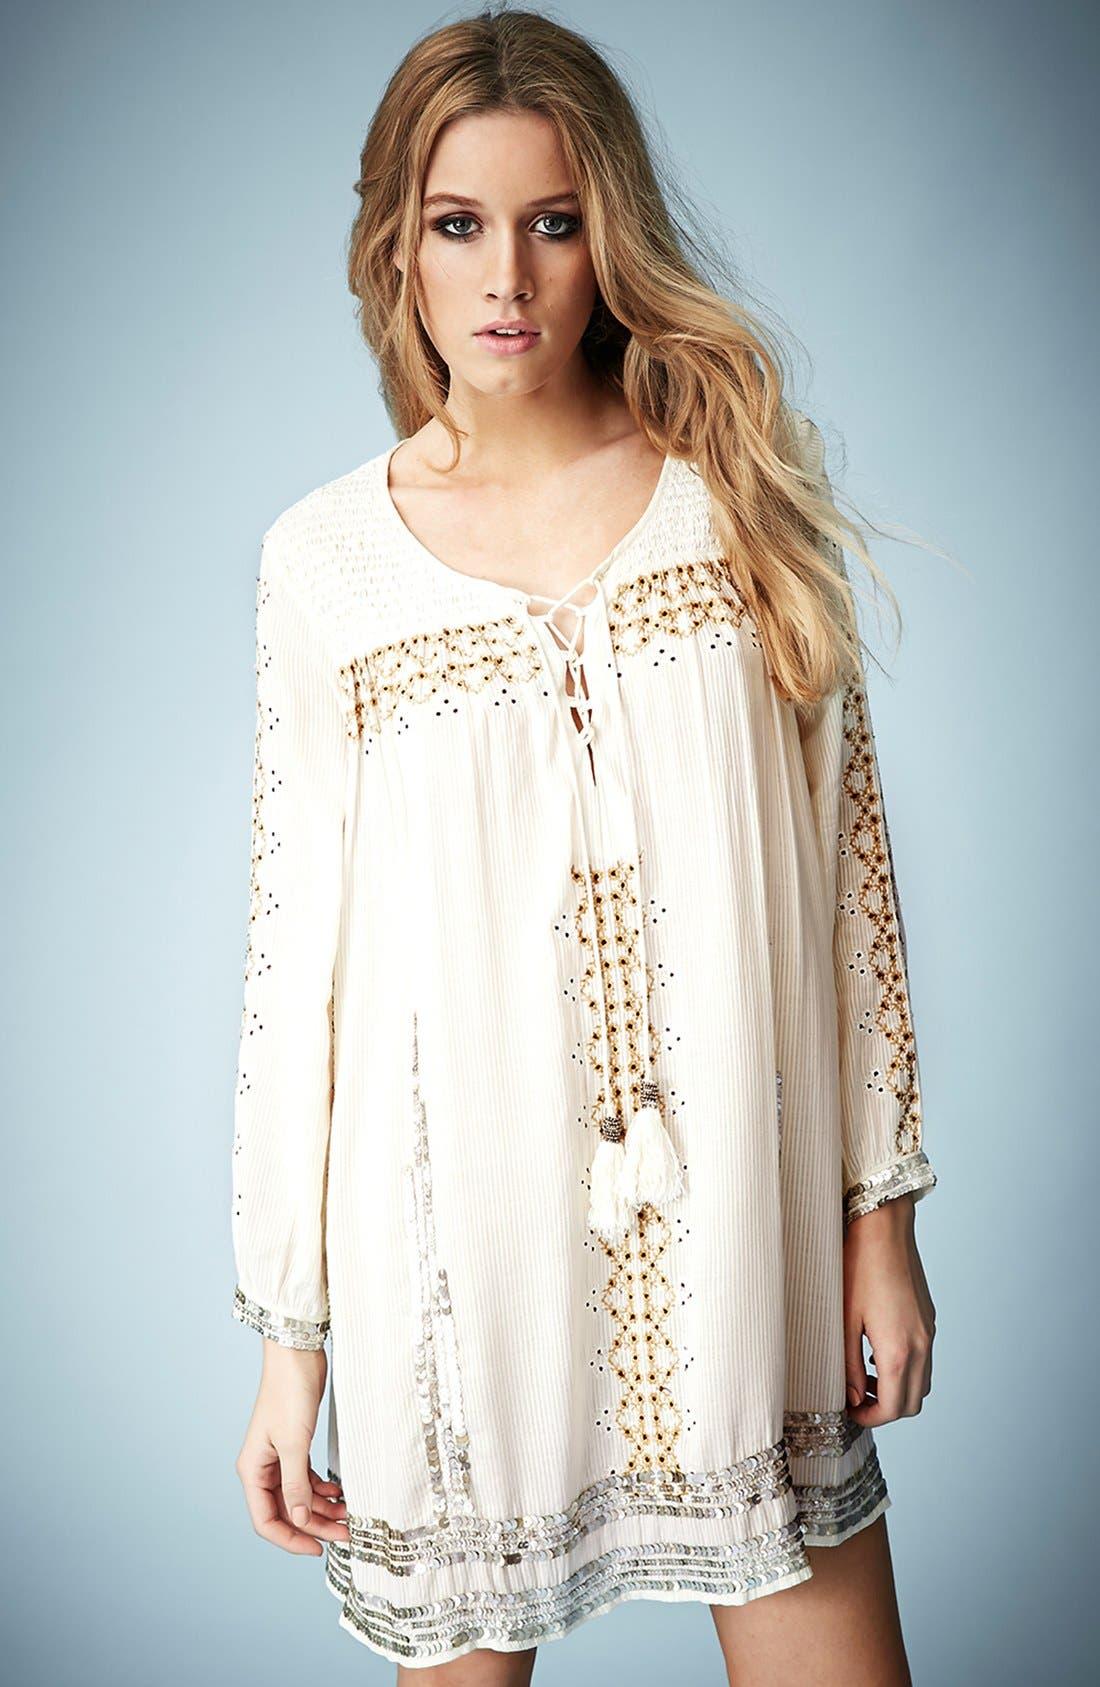 Main Image - Kate Moss for Topshop 'Folk' Smocked Dress